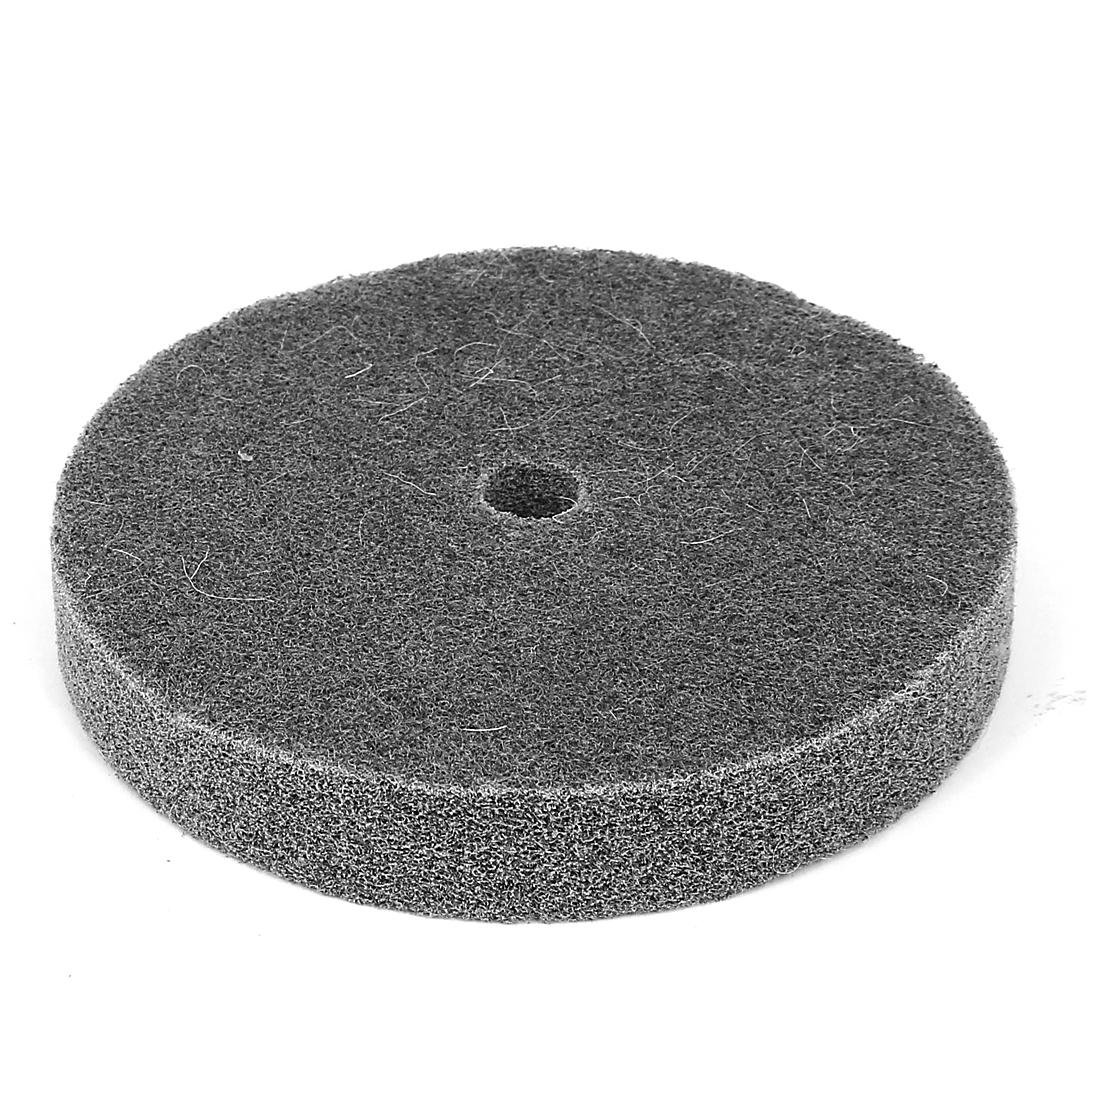 150mm Dia 25mm Thick 180 Grit Nylon Fiber Wheel Abrasive Polishing Buffing Disc